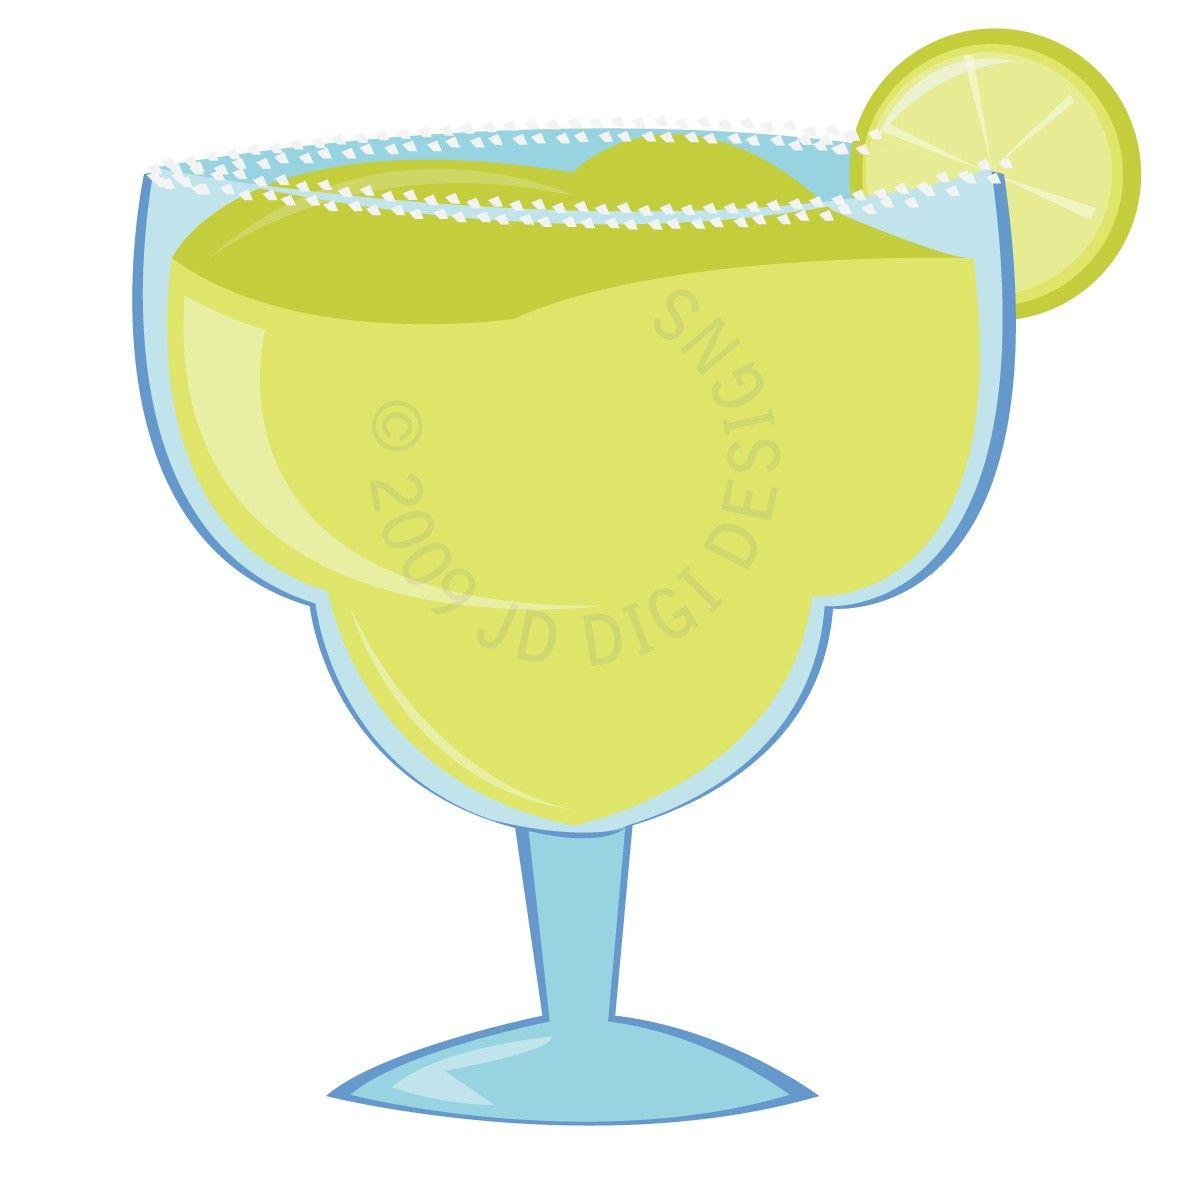 Clipart for margarita glasses graphic transparent download margarita glass template | margarita glass clipart 7 10 from 26 ... graphic transparent download